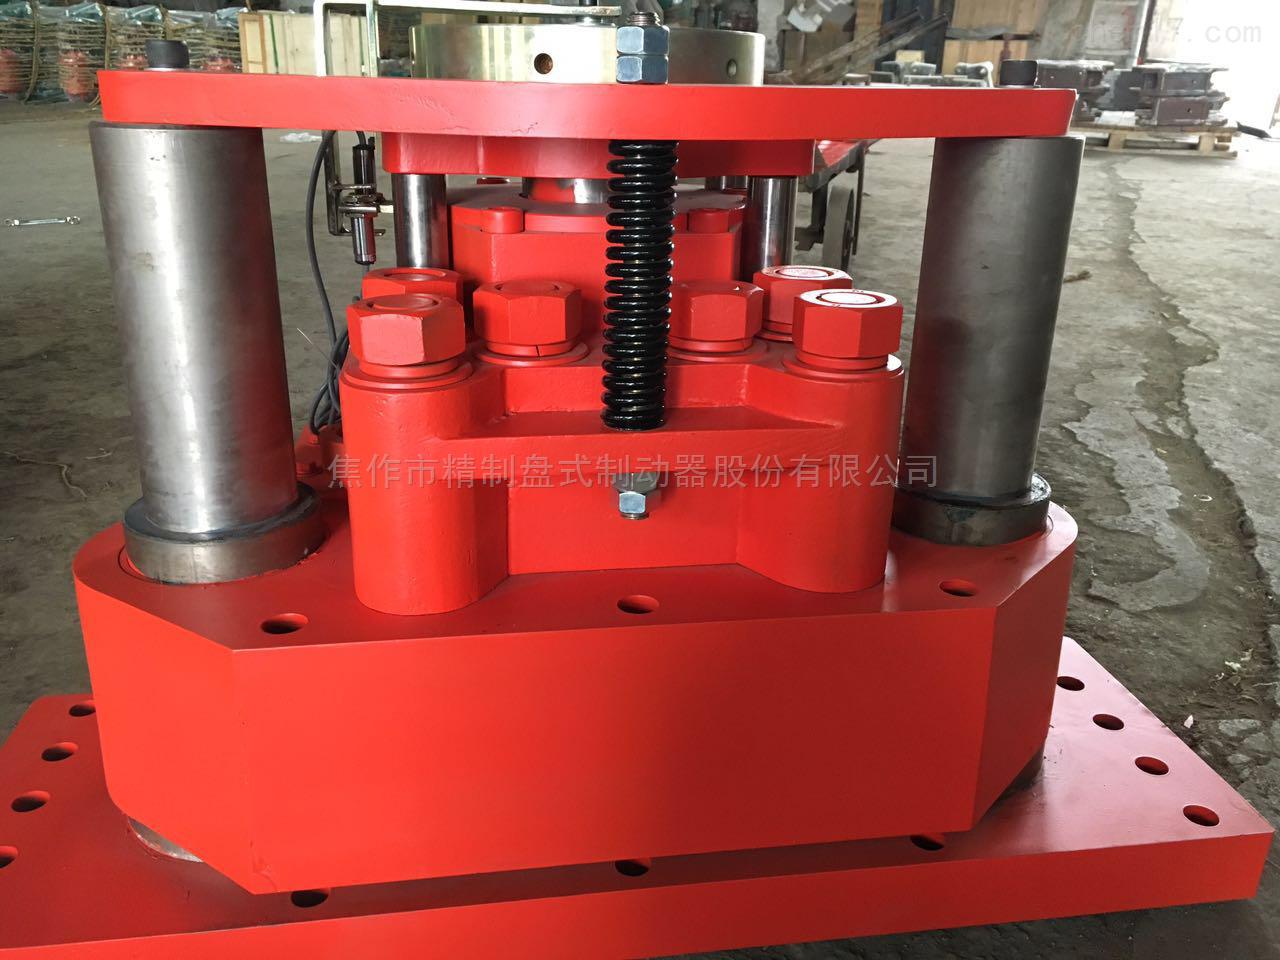 YPZ2II电力液压臂盘式制动器|焦作供应全国